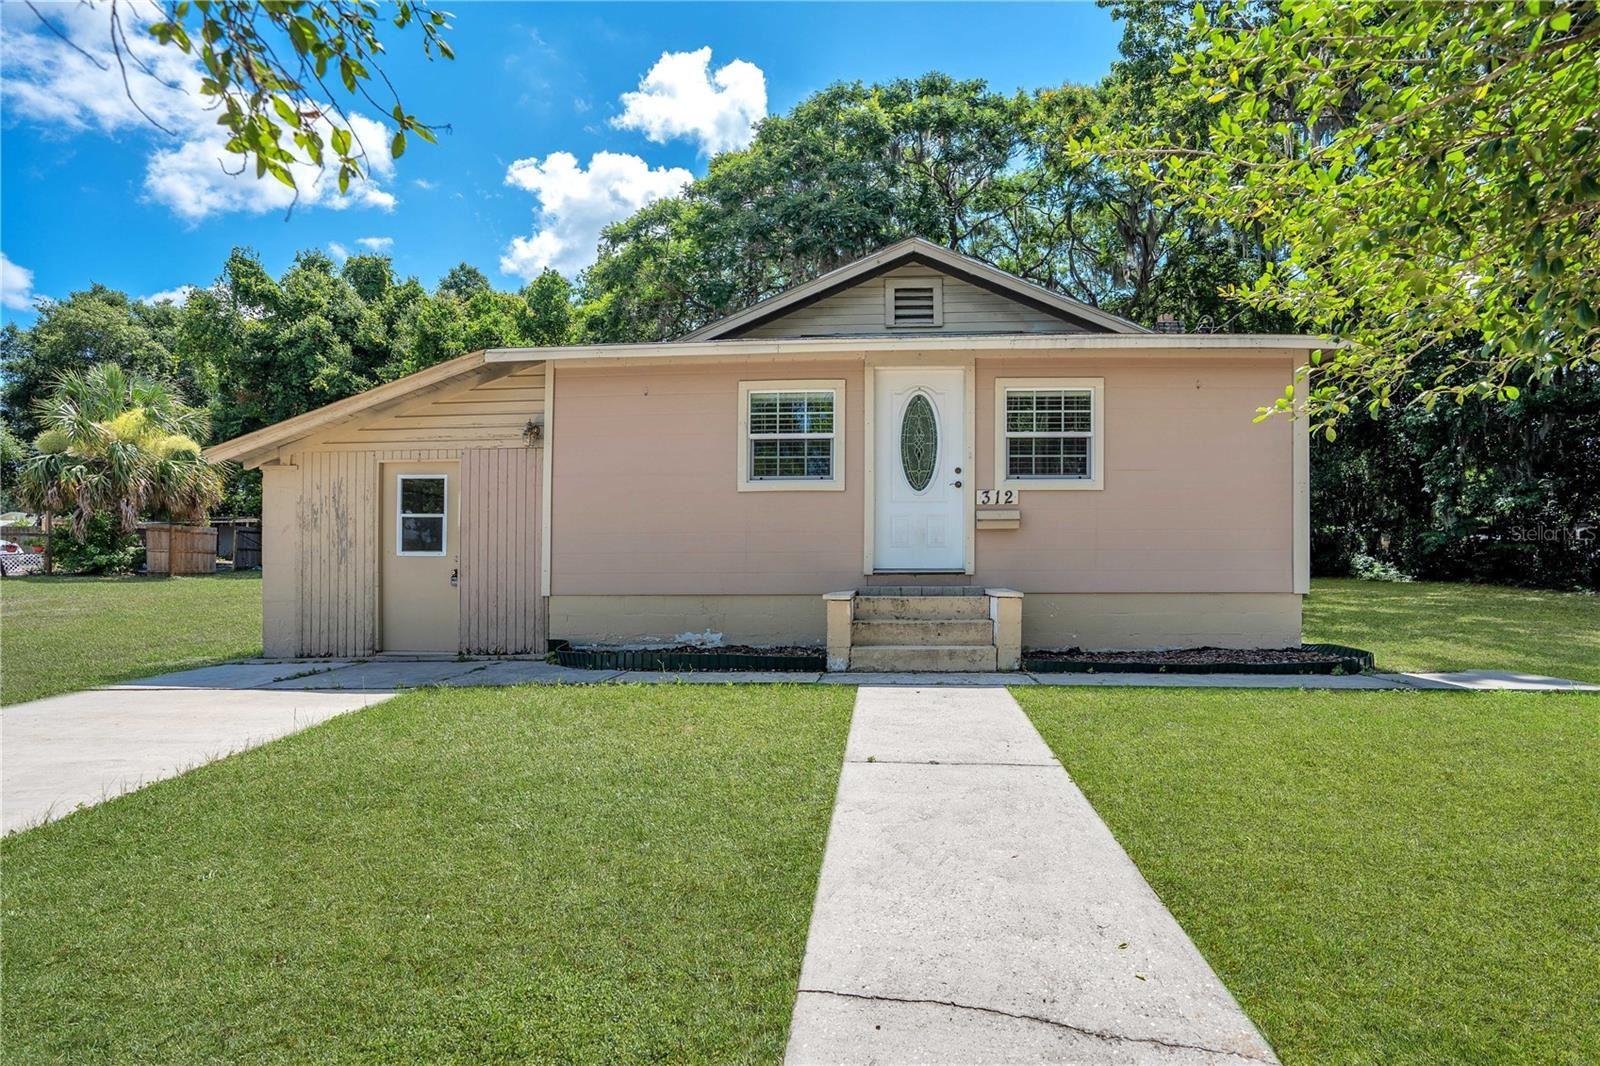 312 S CLAYTON STREET, Mount Dora, FL 32757 - #: O5950486